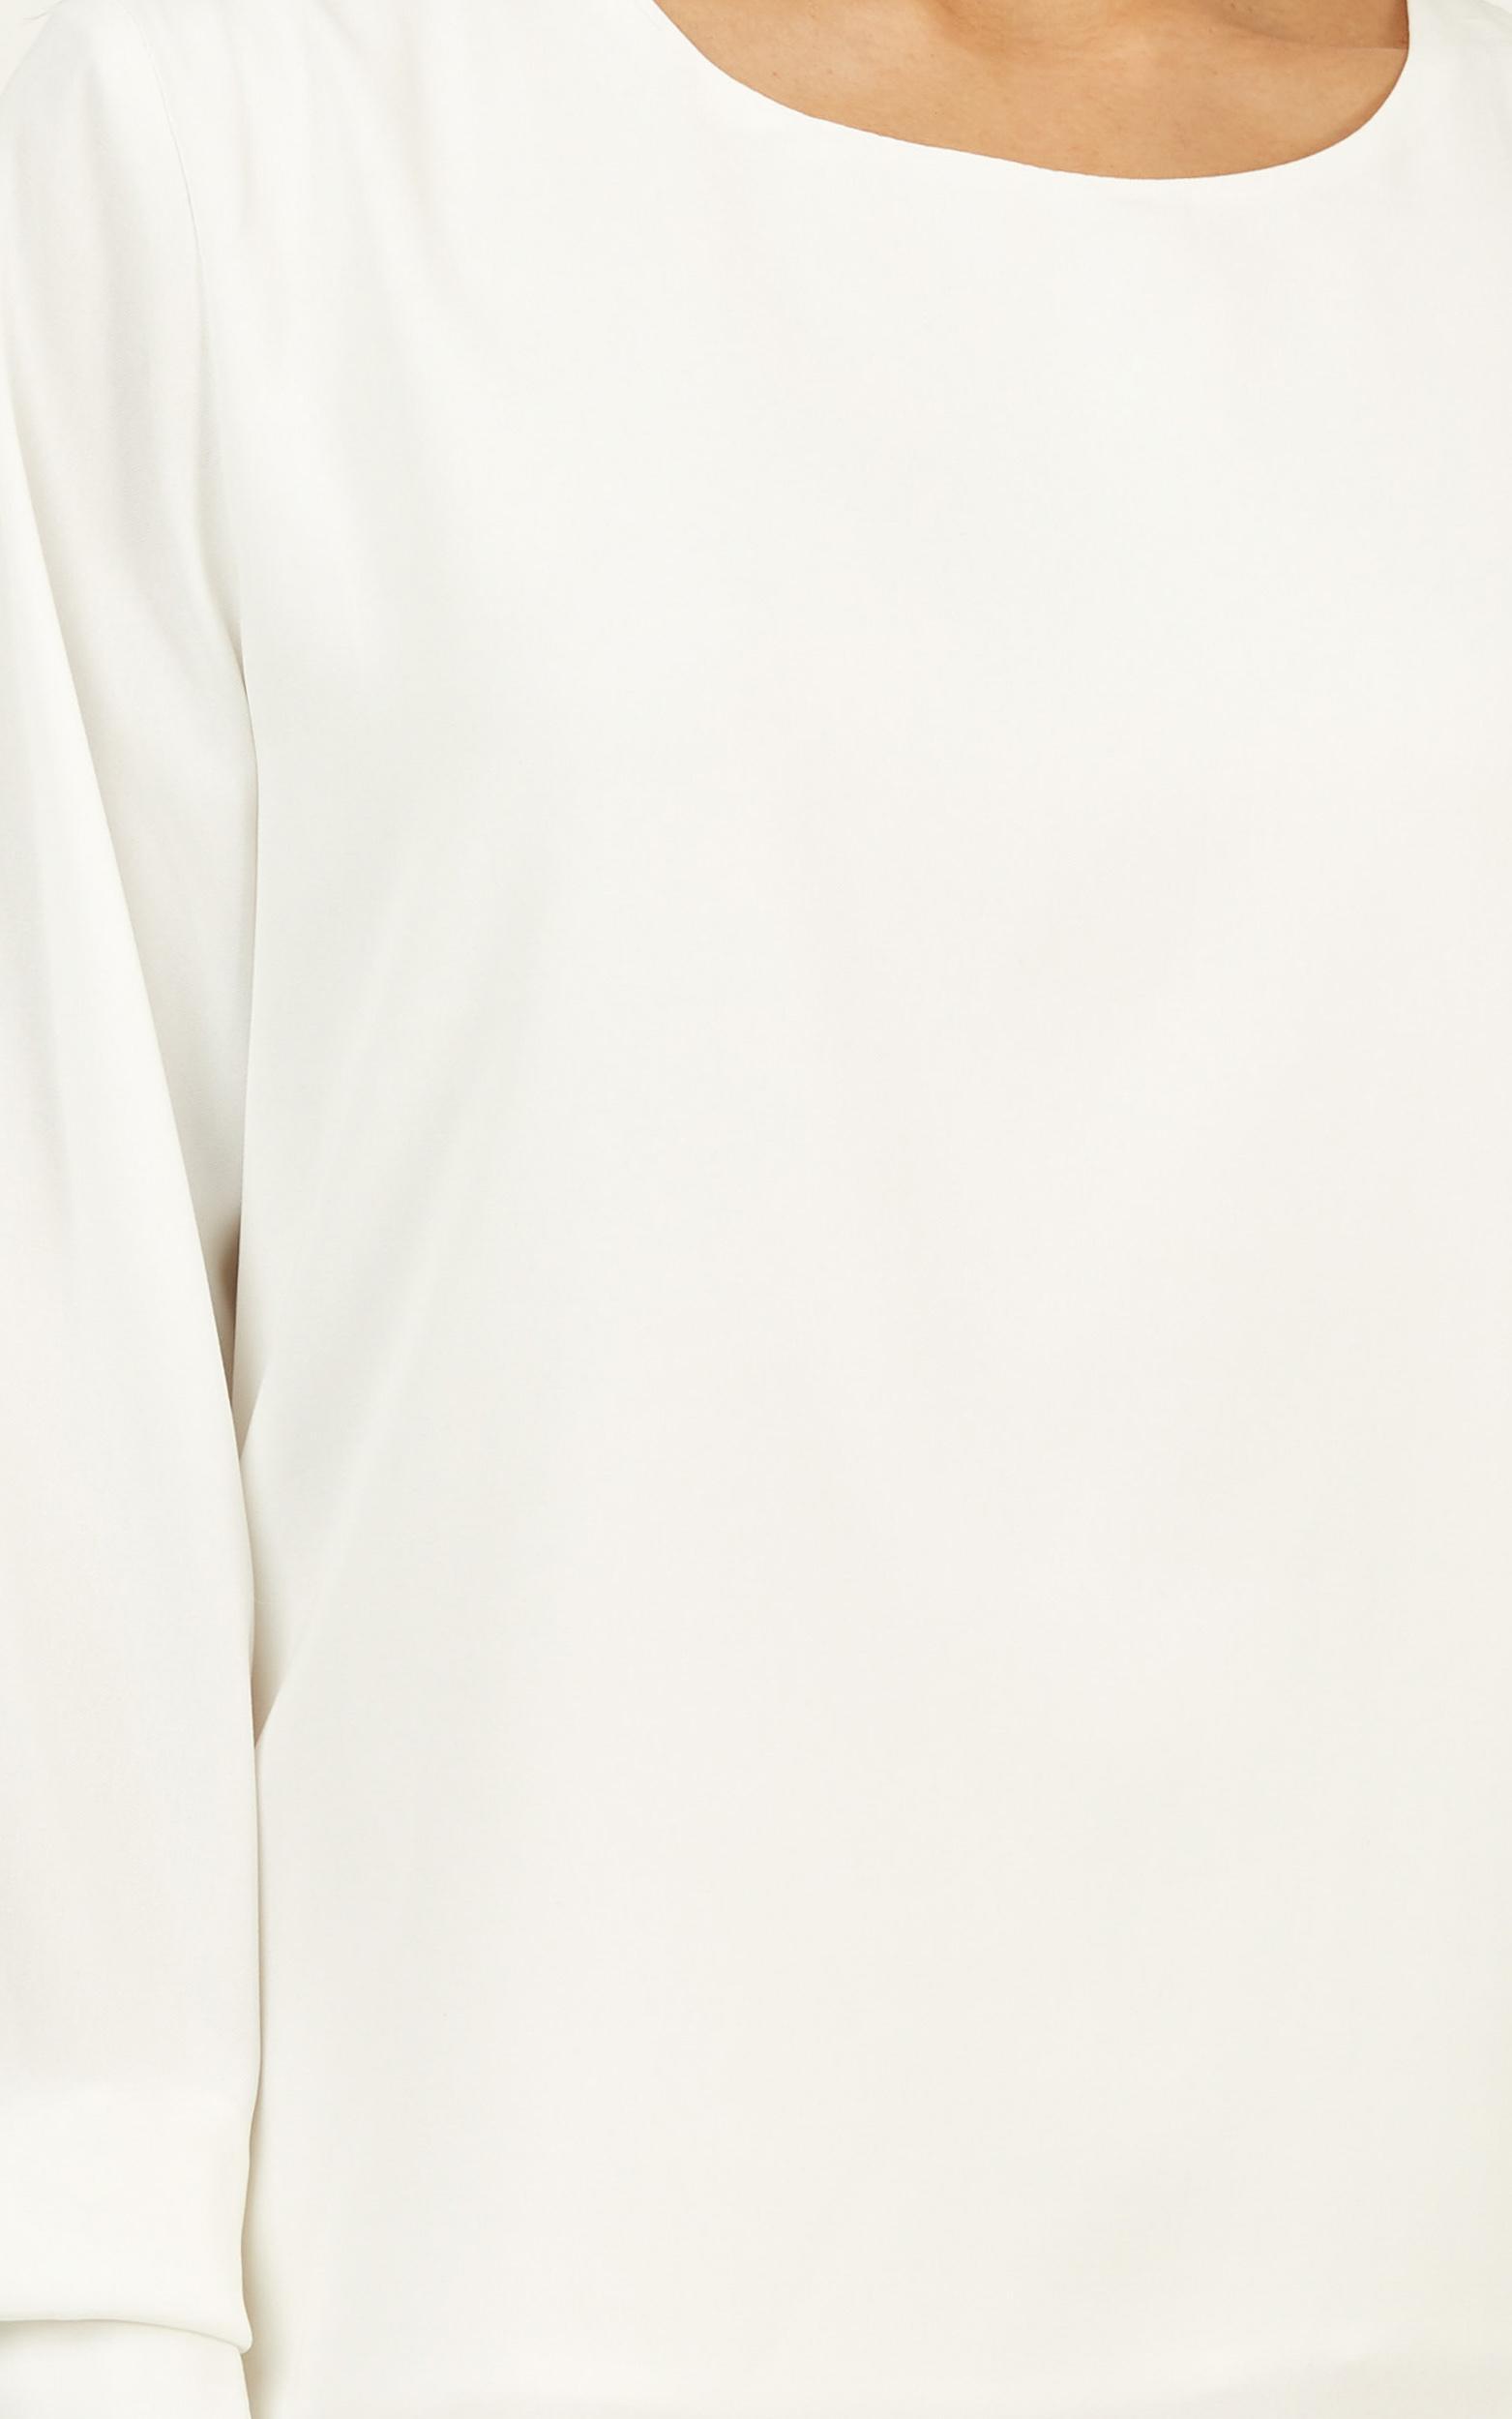 Metropolitan Girl top in white - 16 (XXL), White, hi-res image number null